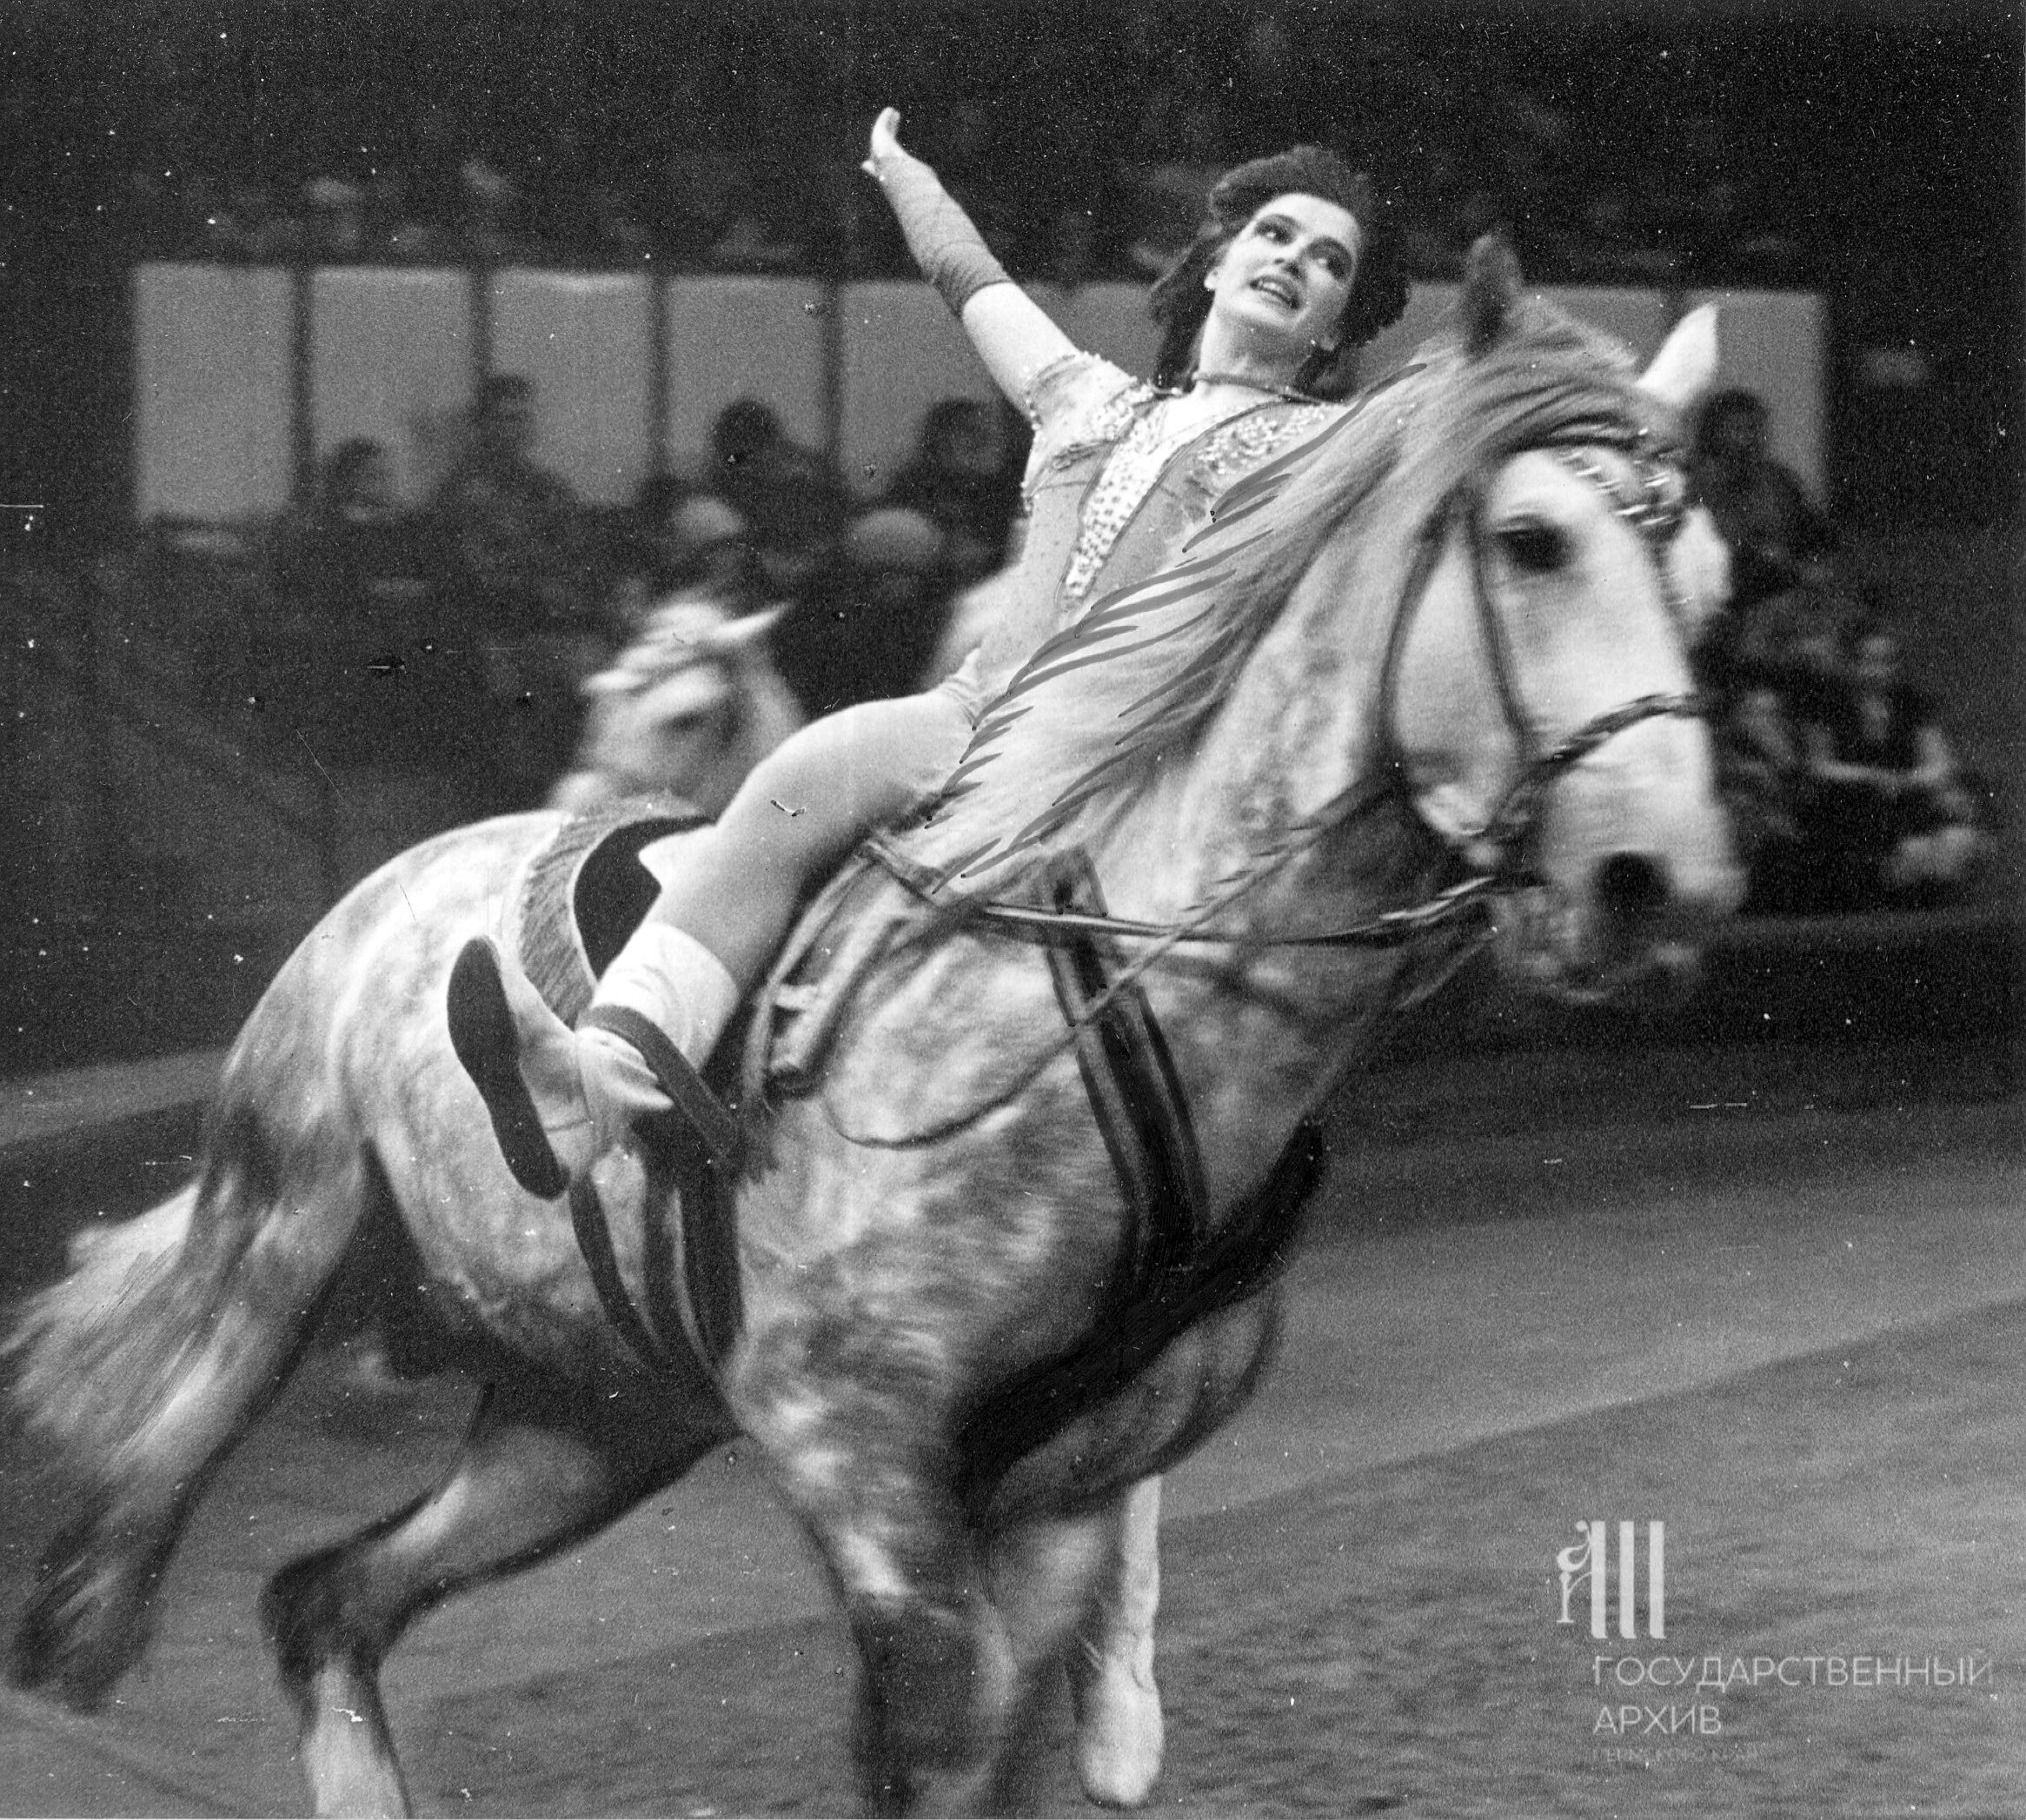 Артистка цирка Королева в конном номере «Свидание», 1992 год